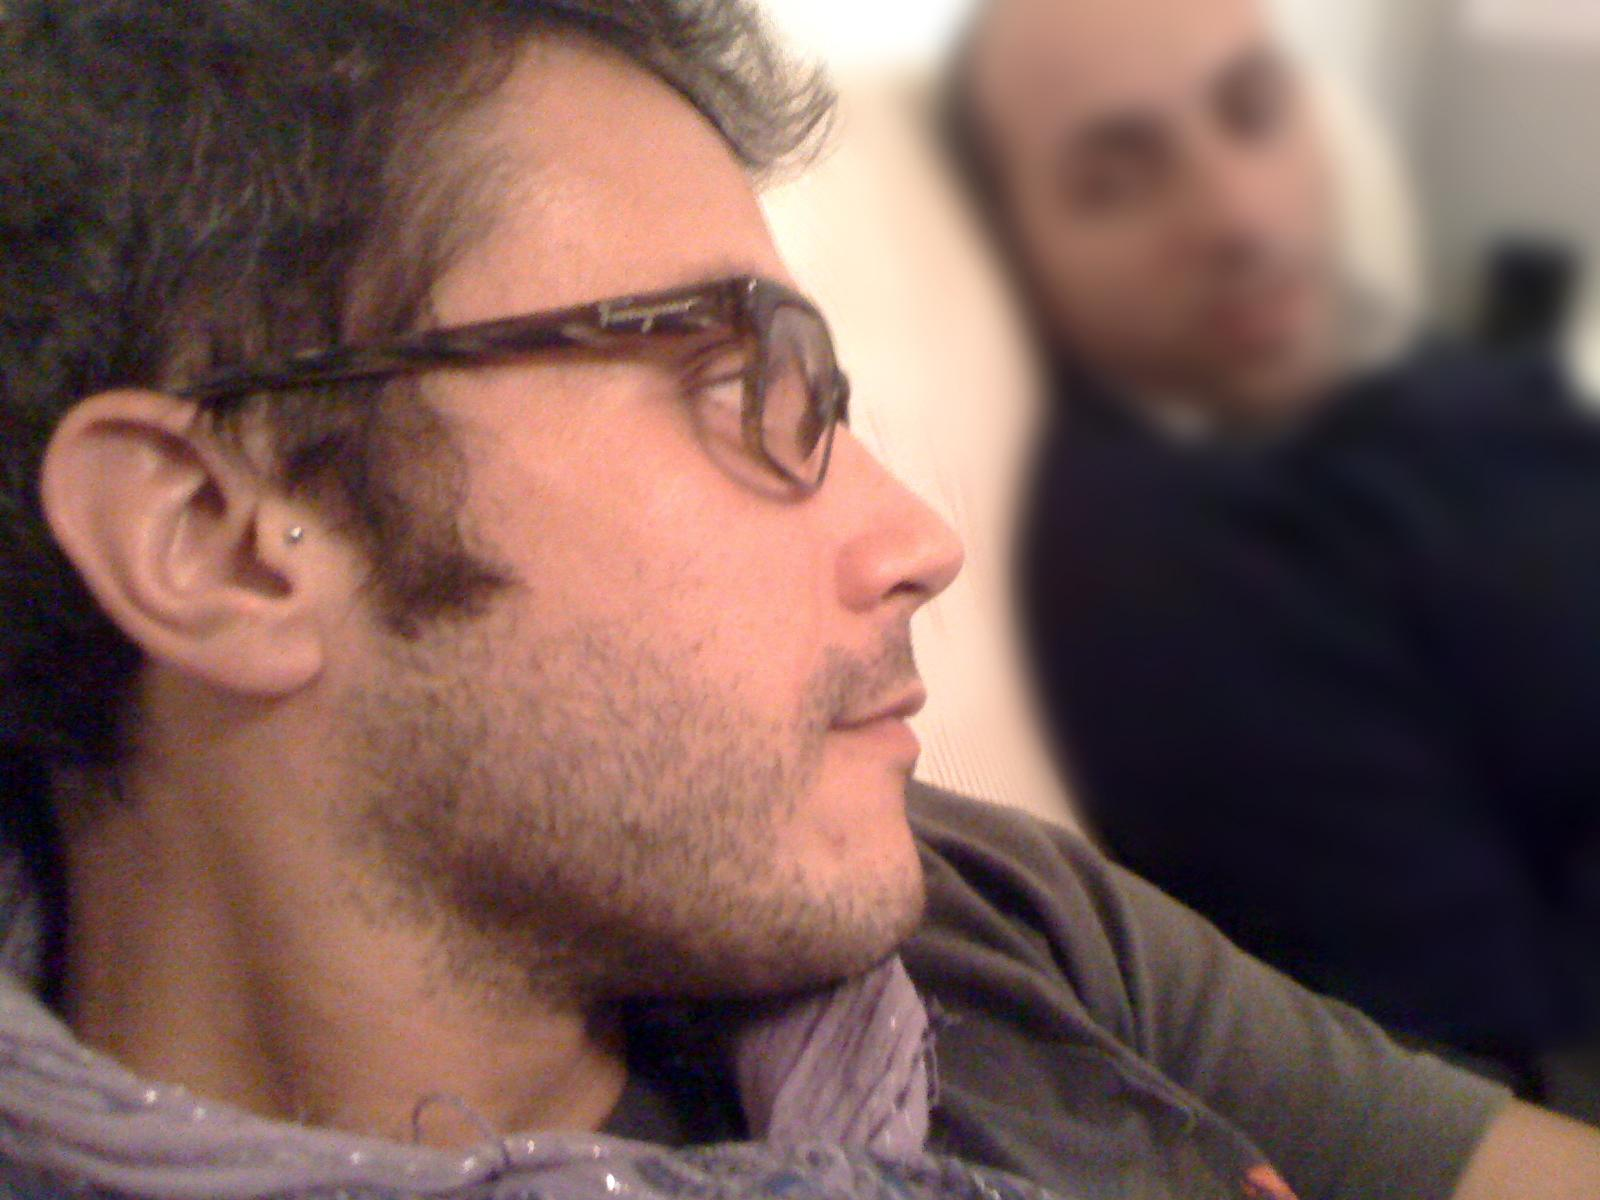 Christian Bocciuolo